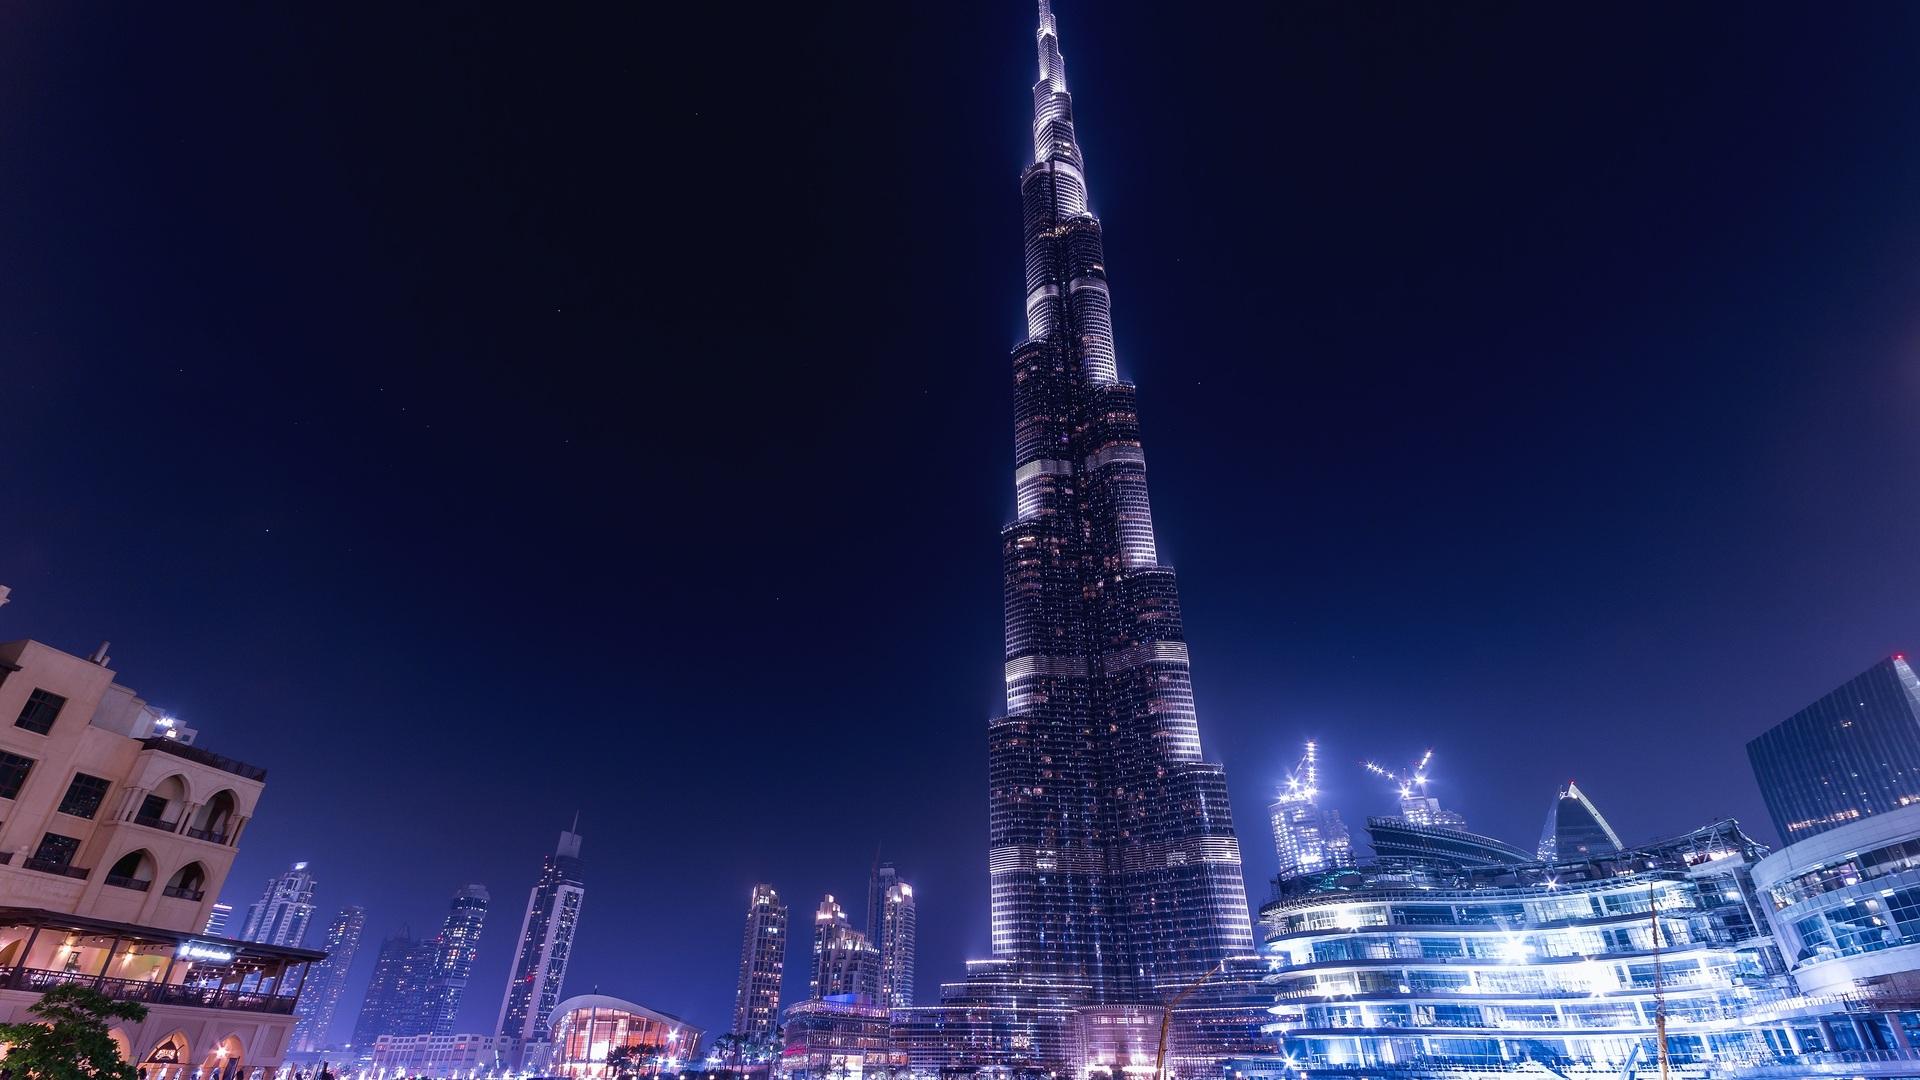 1920x1080 Burj Khalifa Dubai Night Laptop Full Hd 1080p Hd 4k